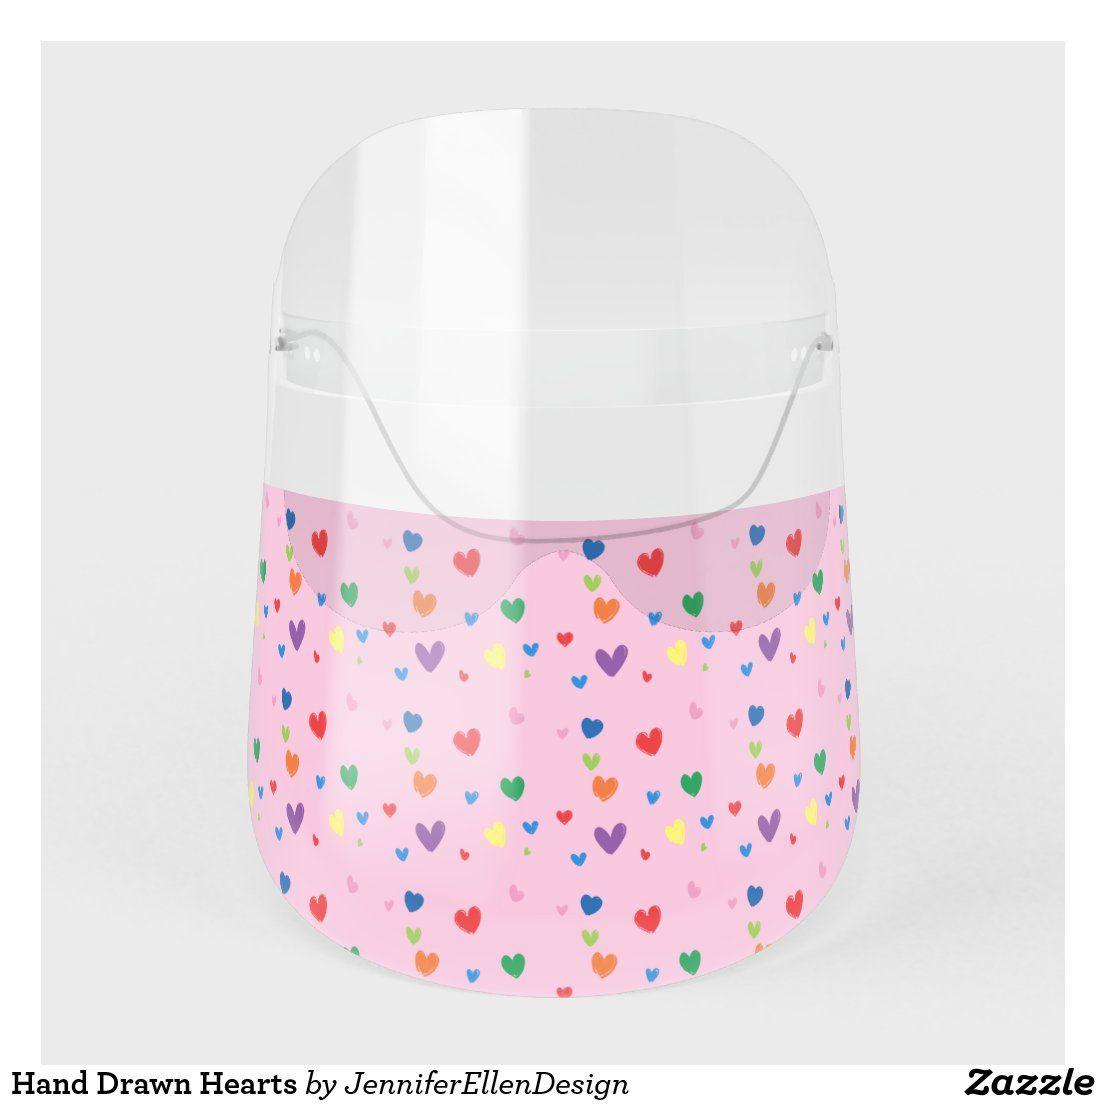 Hand Drawn Hearts Face Shield | Zazzle.com